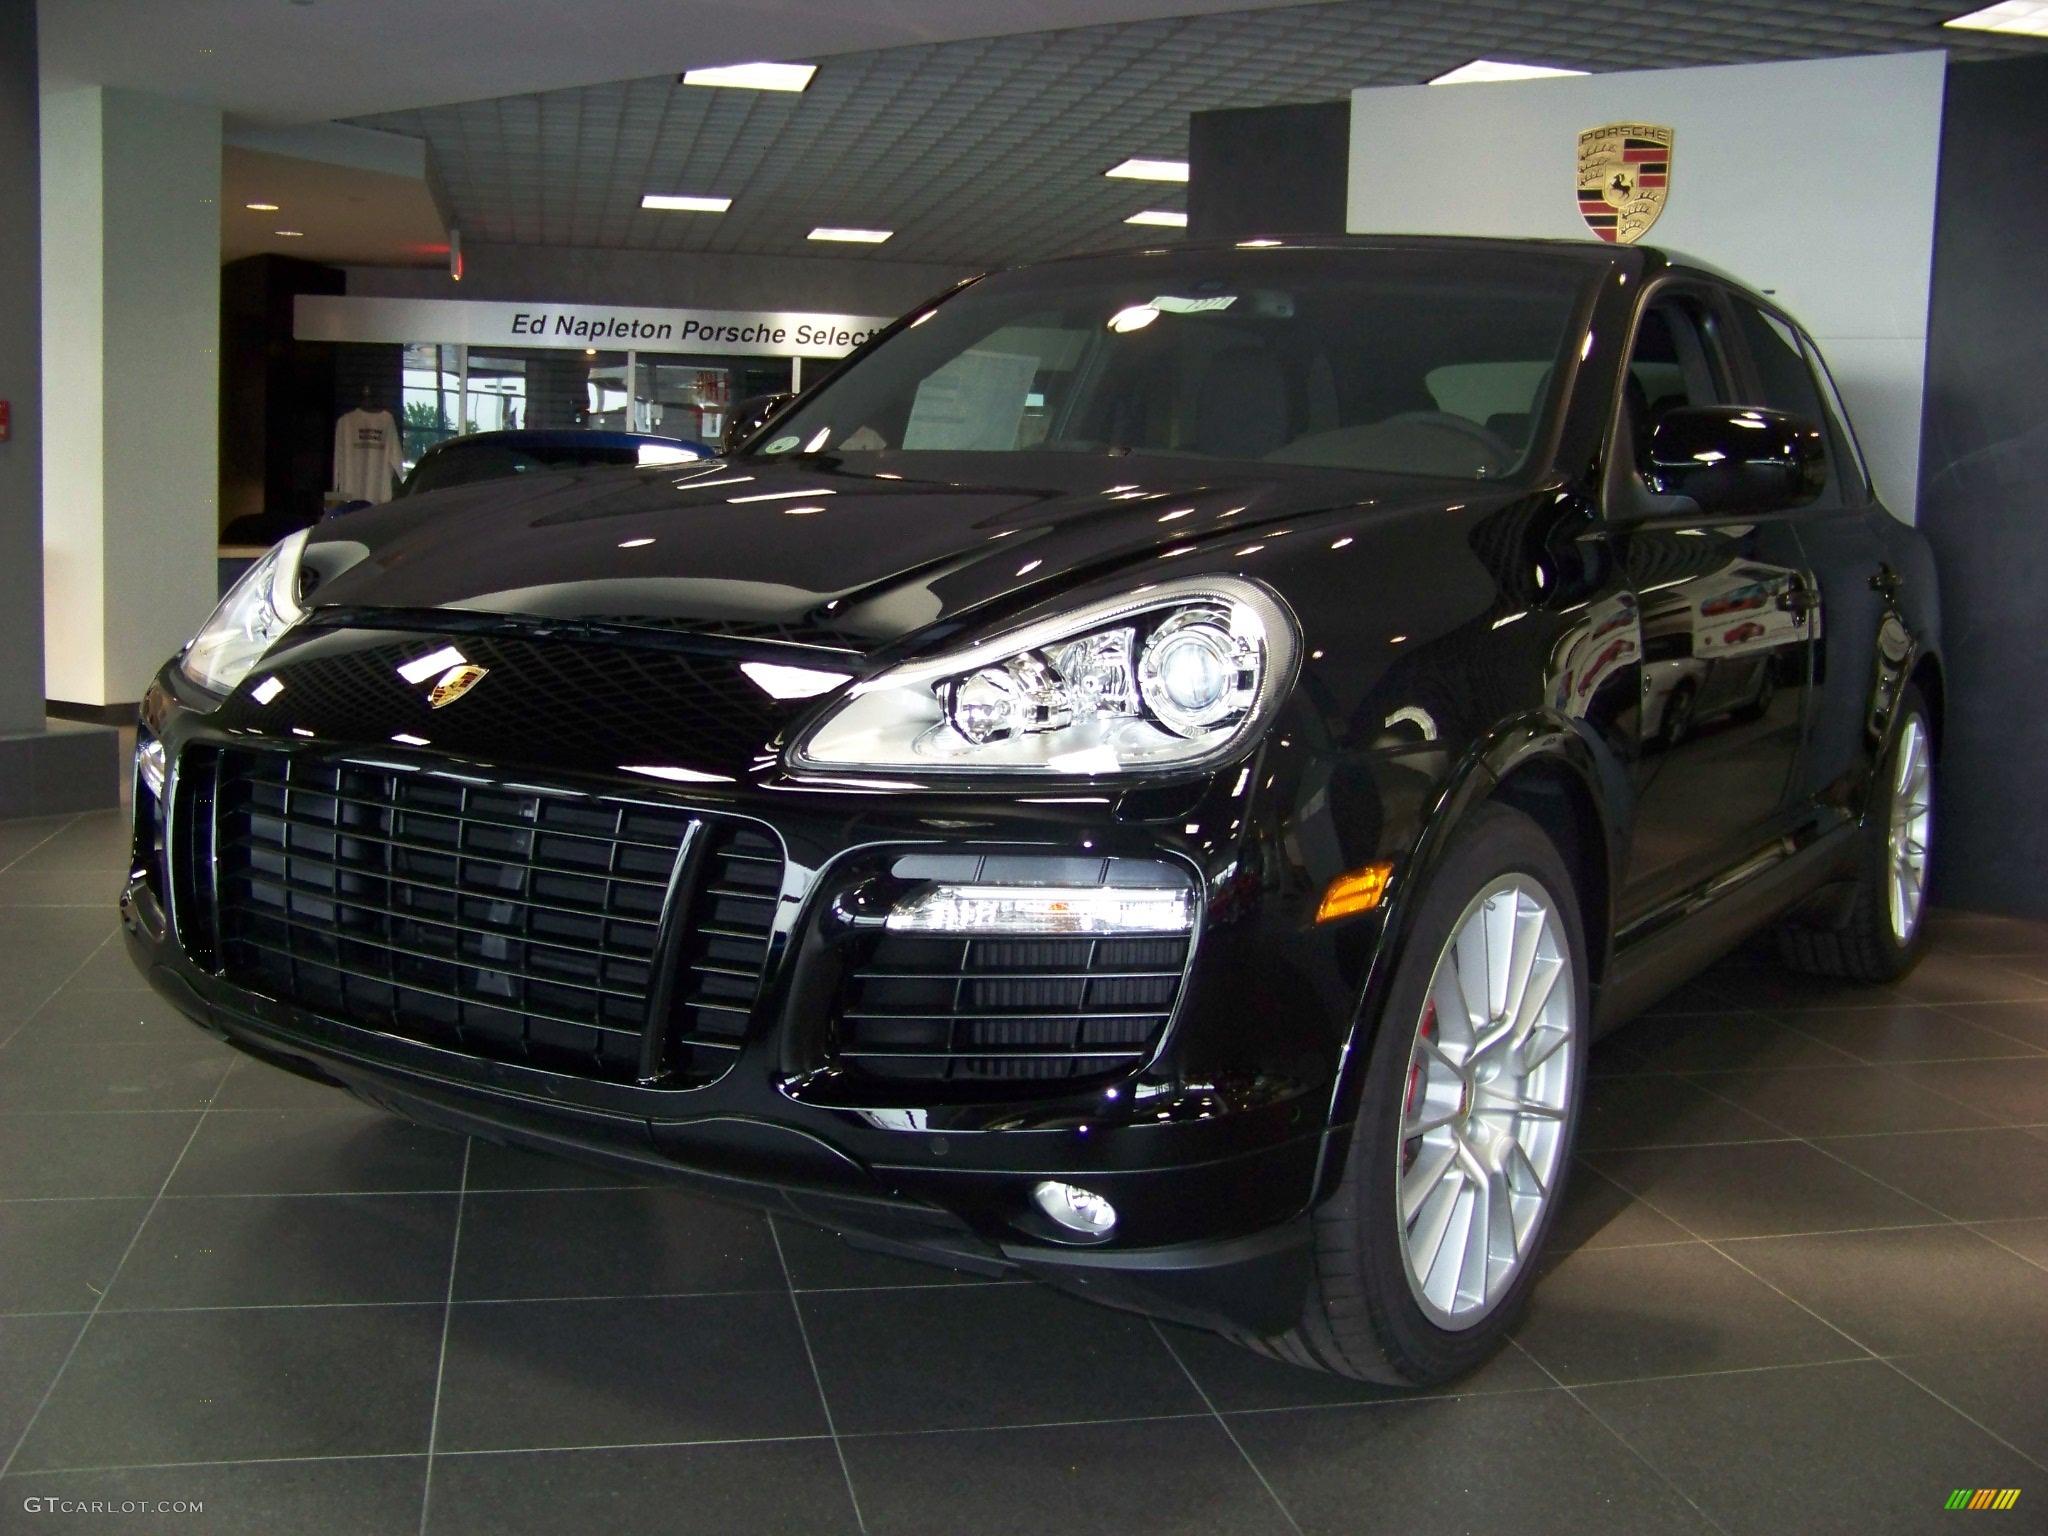 2009 Black Porsche Cayenne Turbo S #11374123 | GTCarLot.com - Car ...